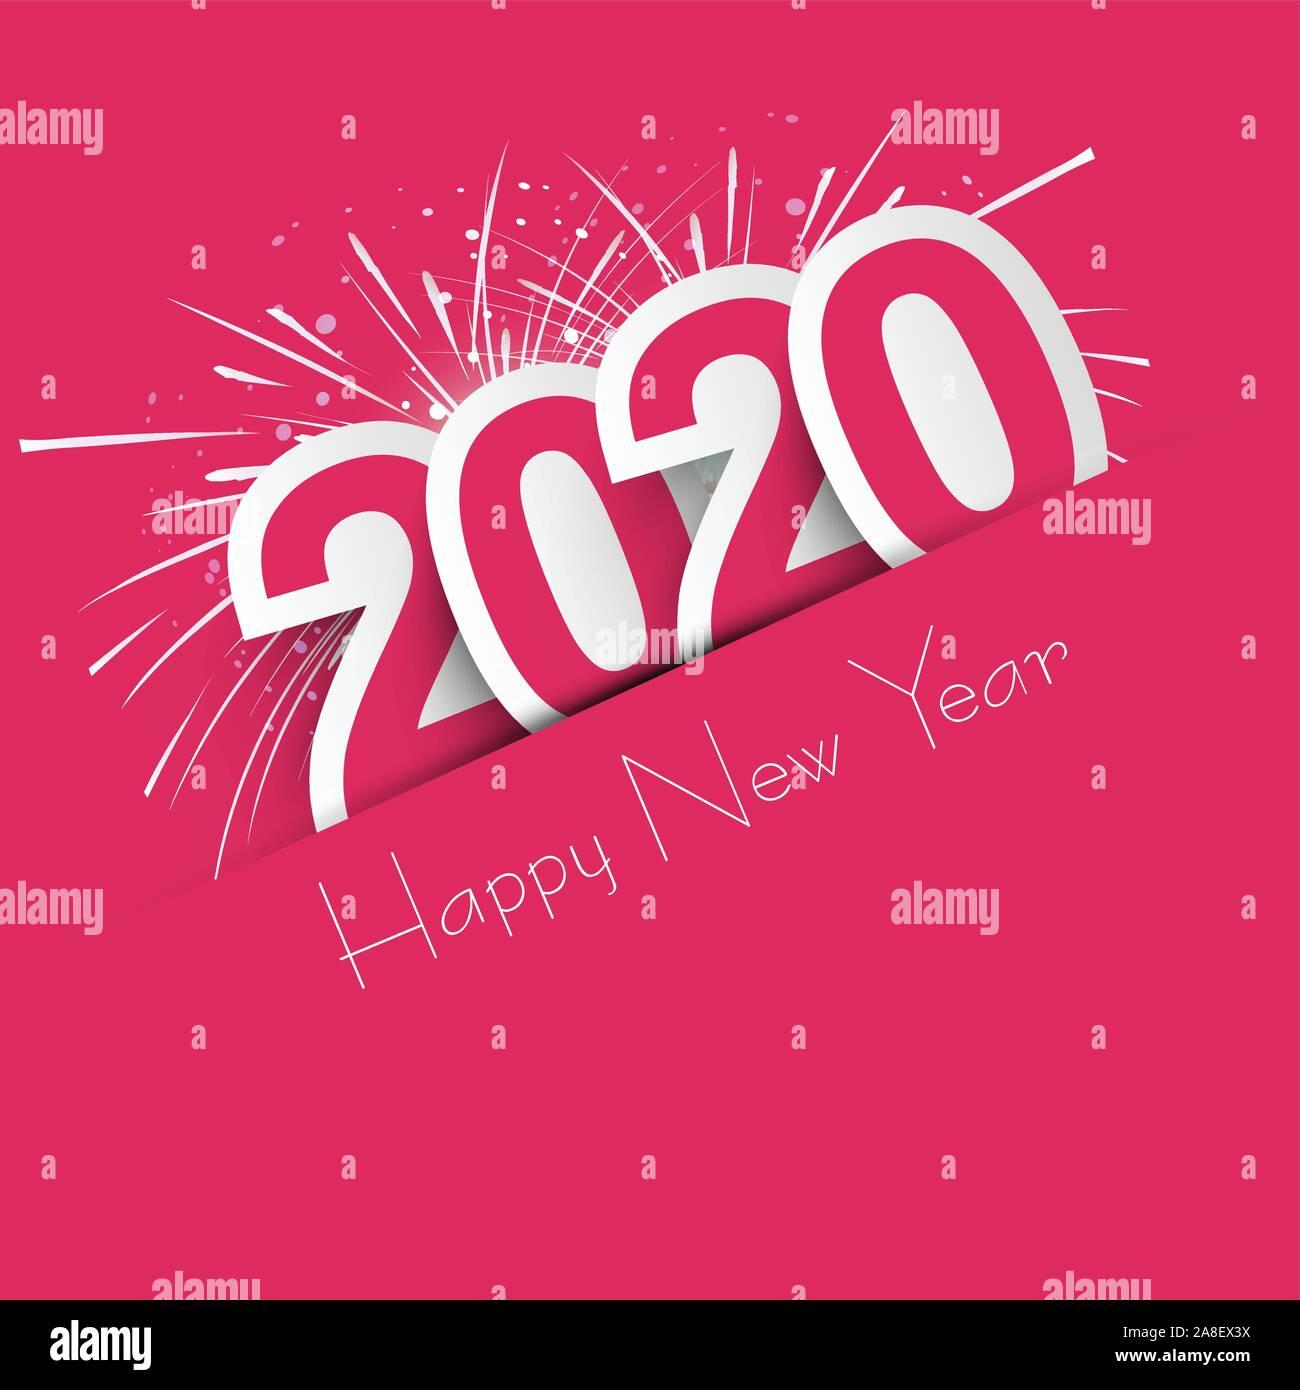 happy new year 2020 2020 wishes happy new year 2020 celebrating 2020 calendar vector illustration stock vector image art alamy https www alamy com happy new year 2020 2020 wishes happy new year 2020 celebrating 2020 calendar vector illustration image332242062 html